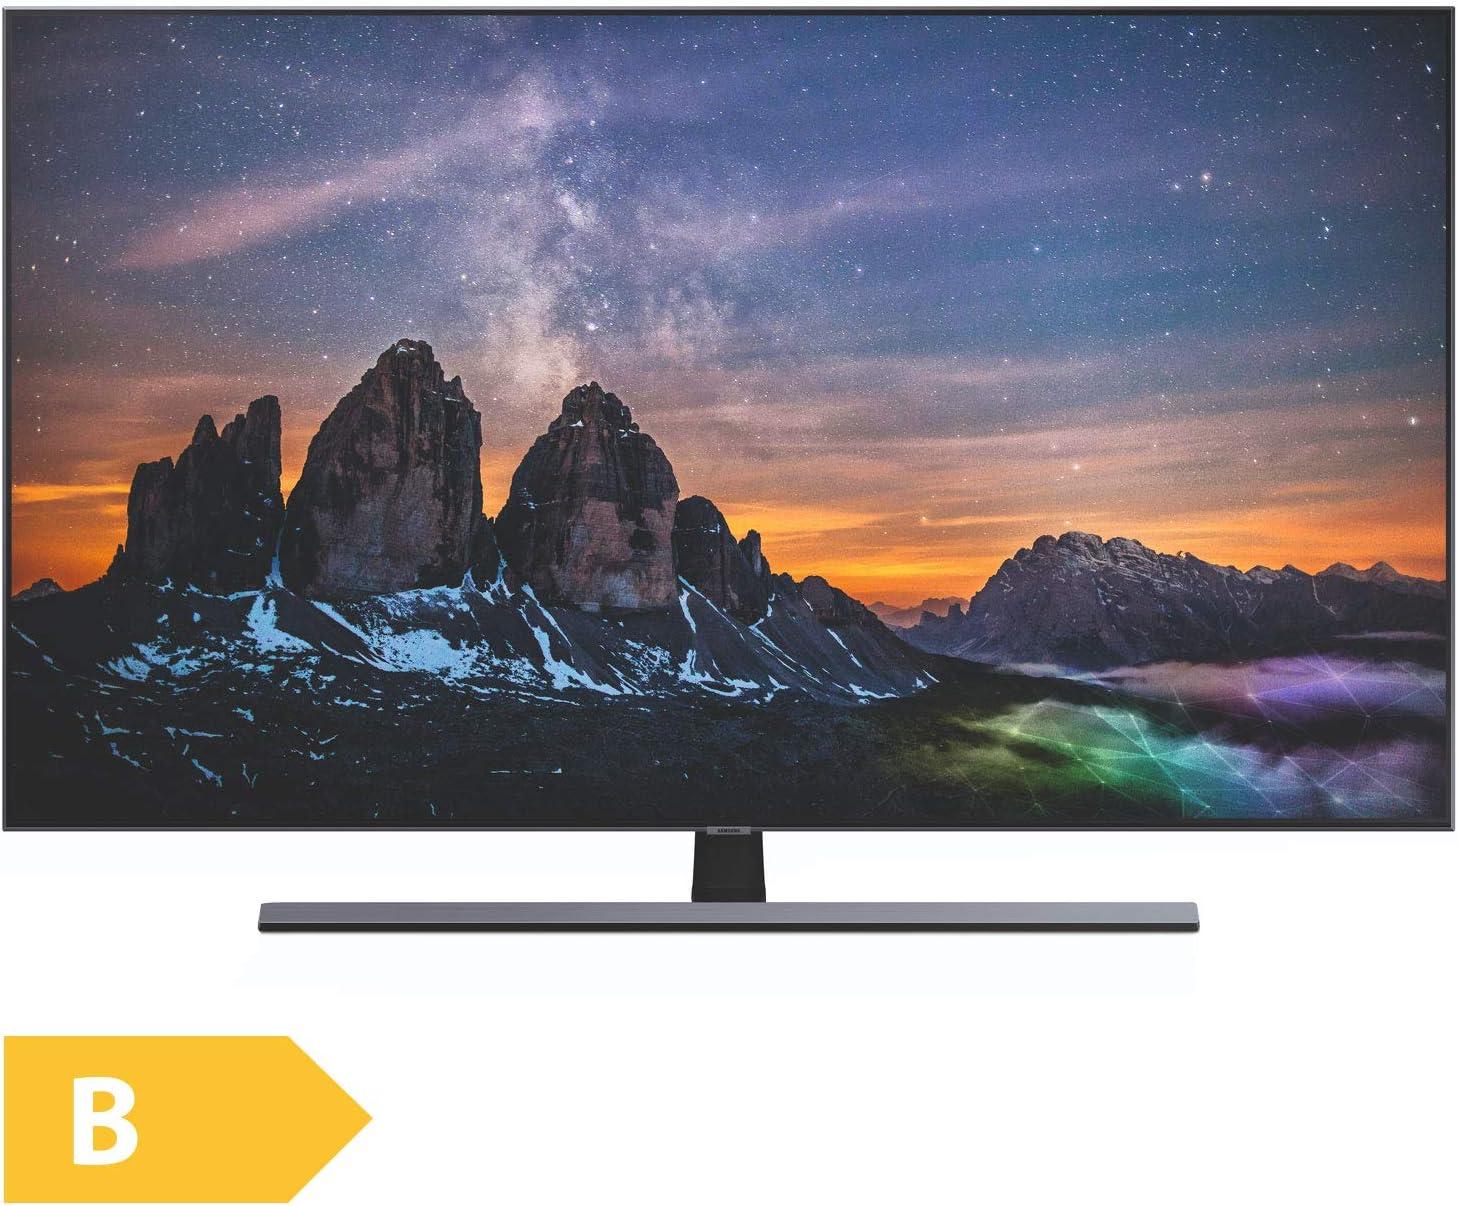 Samsung Q82R - Televisor QE65Q82R (163 cm, 65 pulgadas), 4 K, QLED, QE65Q82R (Q HDR, Ultra HD, HDR, sintonizador Twin Tuner, Smart TV): Amazon.es: Electrónica